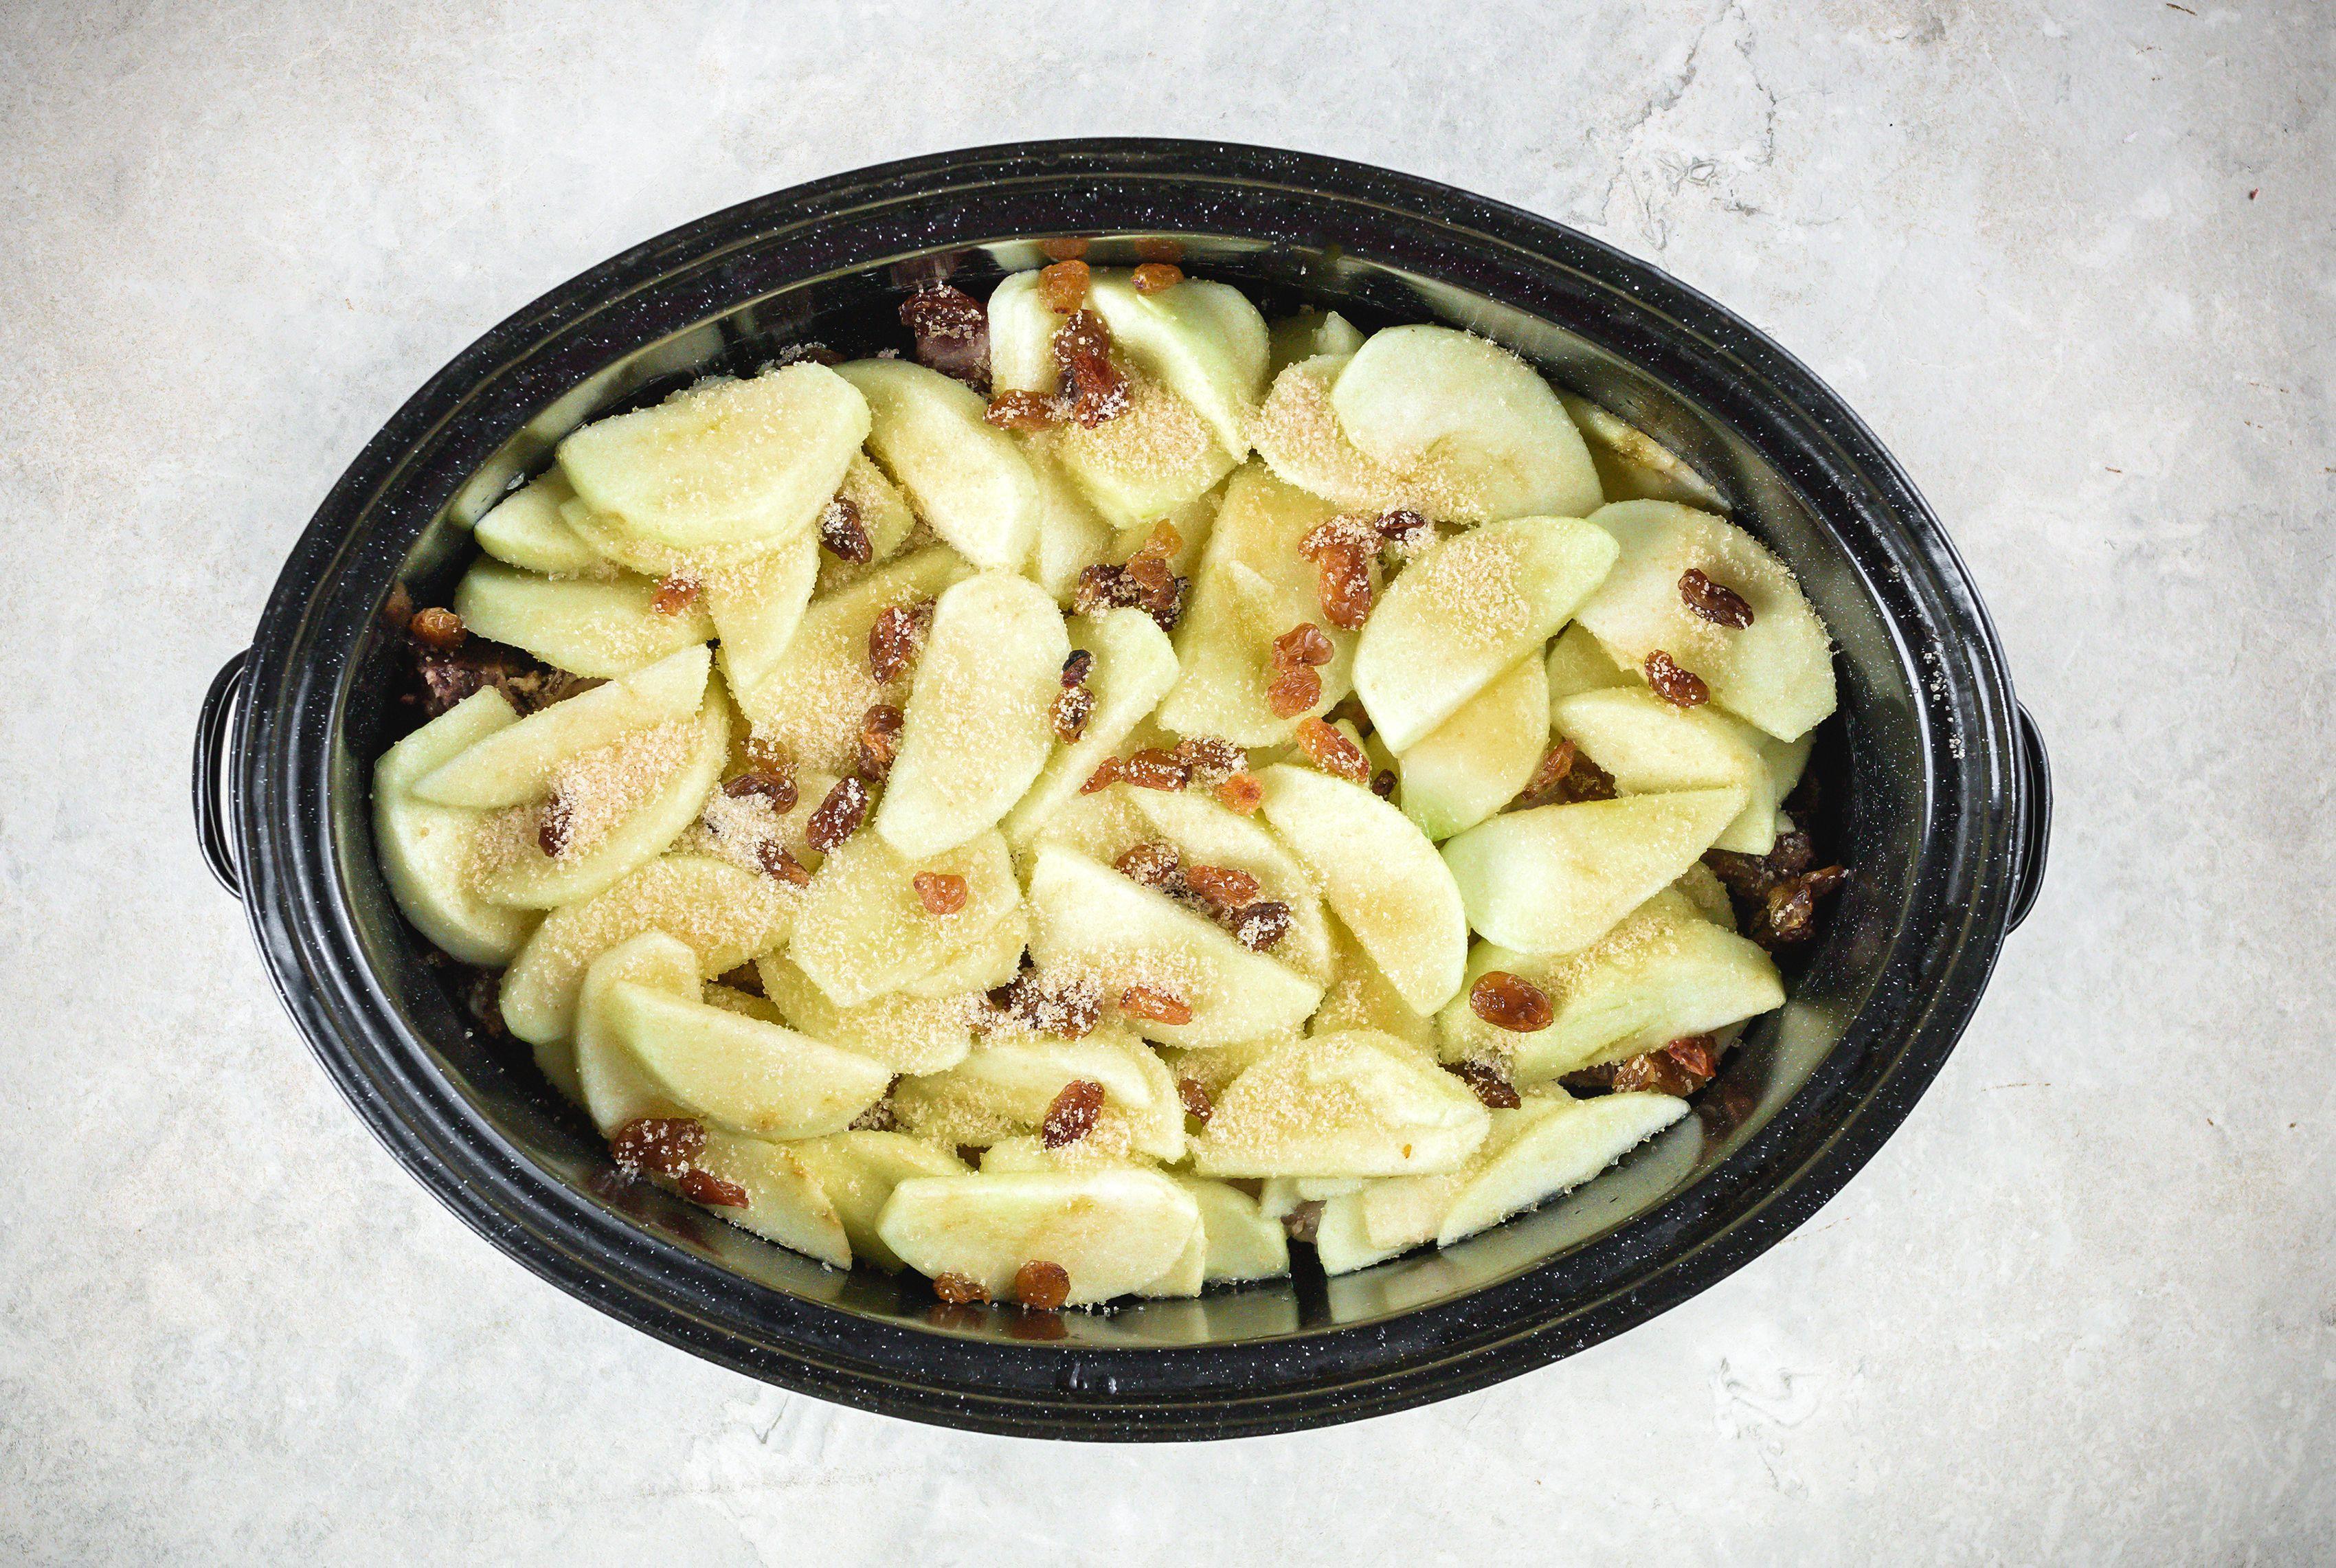 Apples in slowcooker